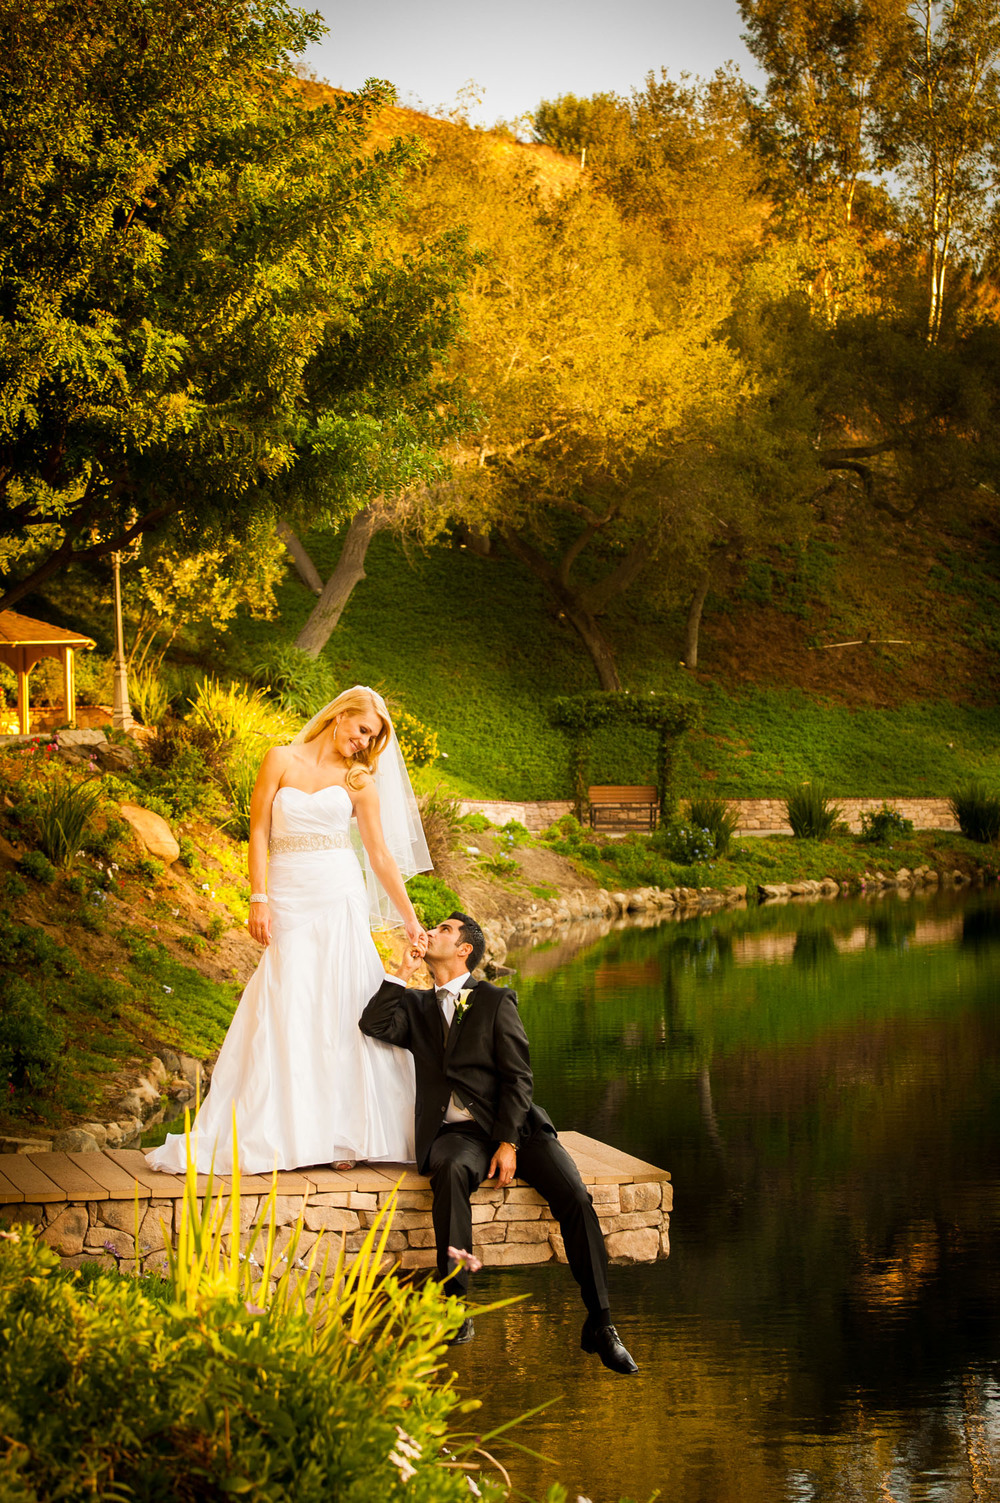 stewart_bertrand_wedding_photography_fclblogwed-1007.jpg